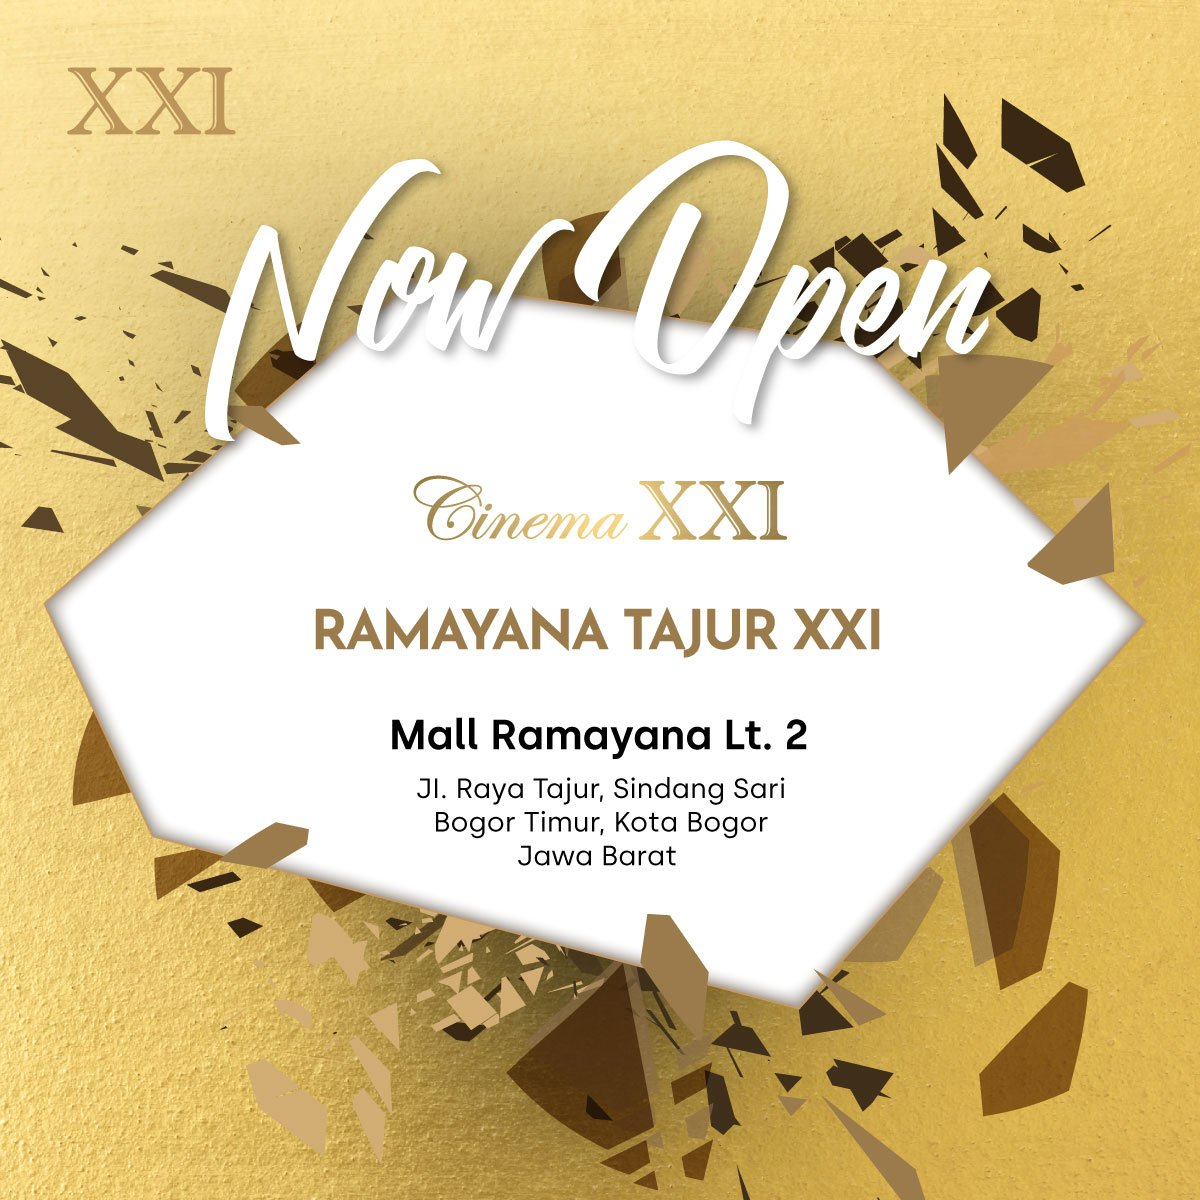 Jadwal bioskop xxi ramayana cirebon